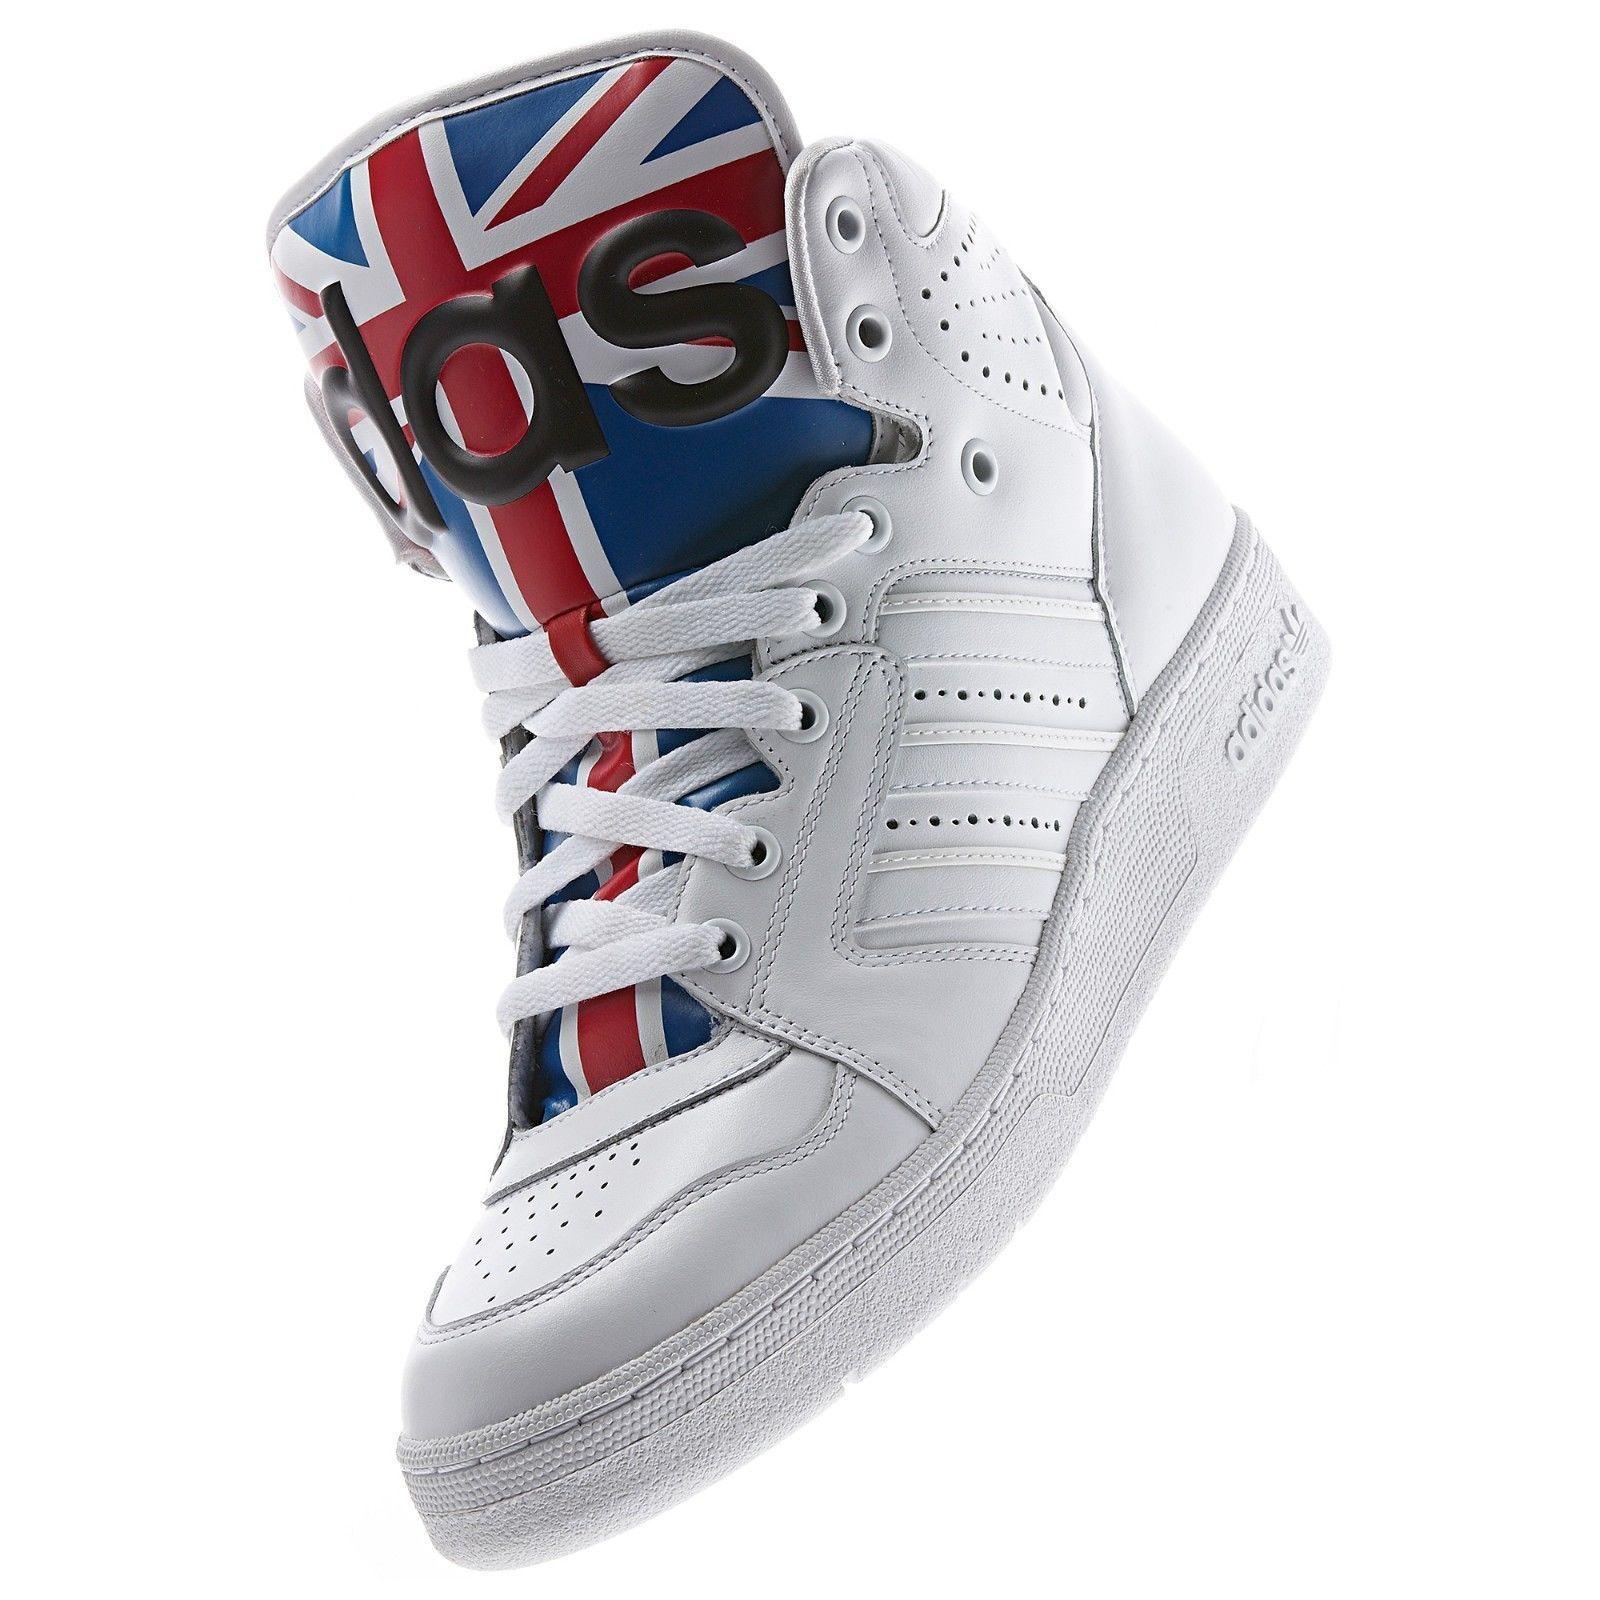 fd72881d4a40 ... Adidas Adidas Adidas Originals Men s Jeremy Scott Instinct Hi Union  Shoes Sizes 4.5 us D65204 81da33 ...